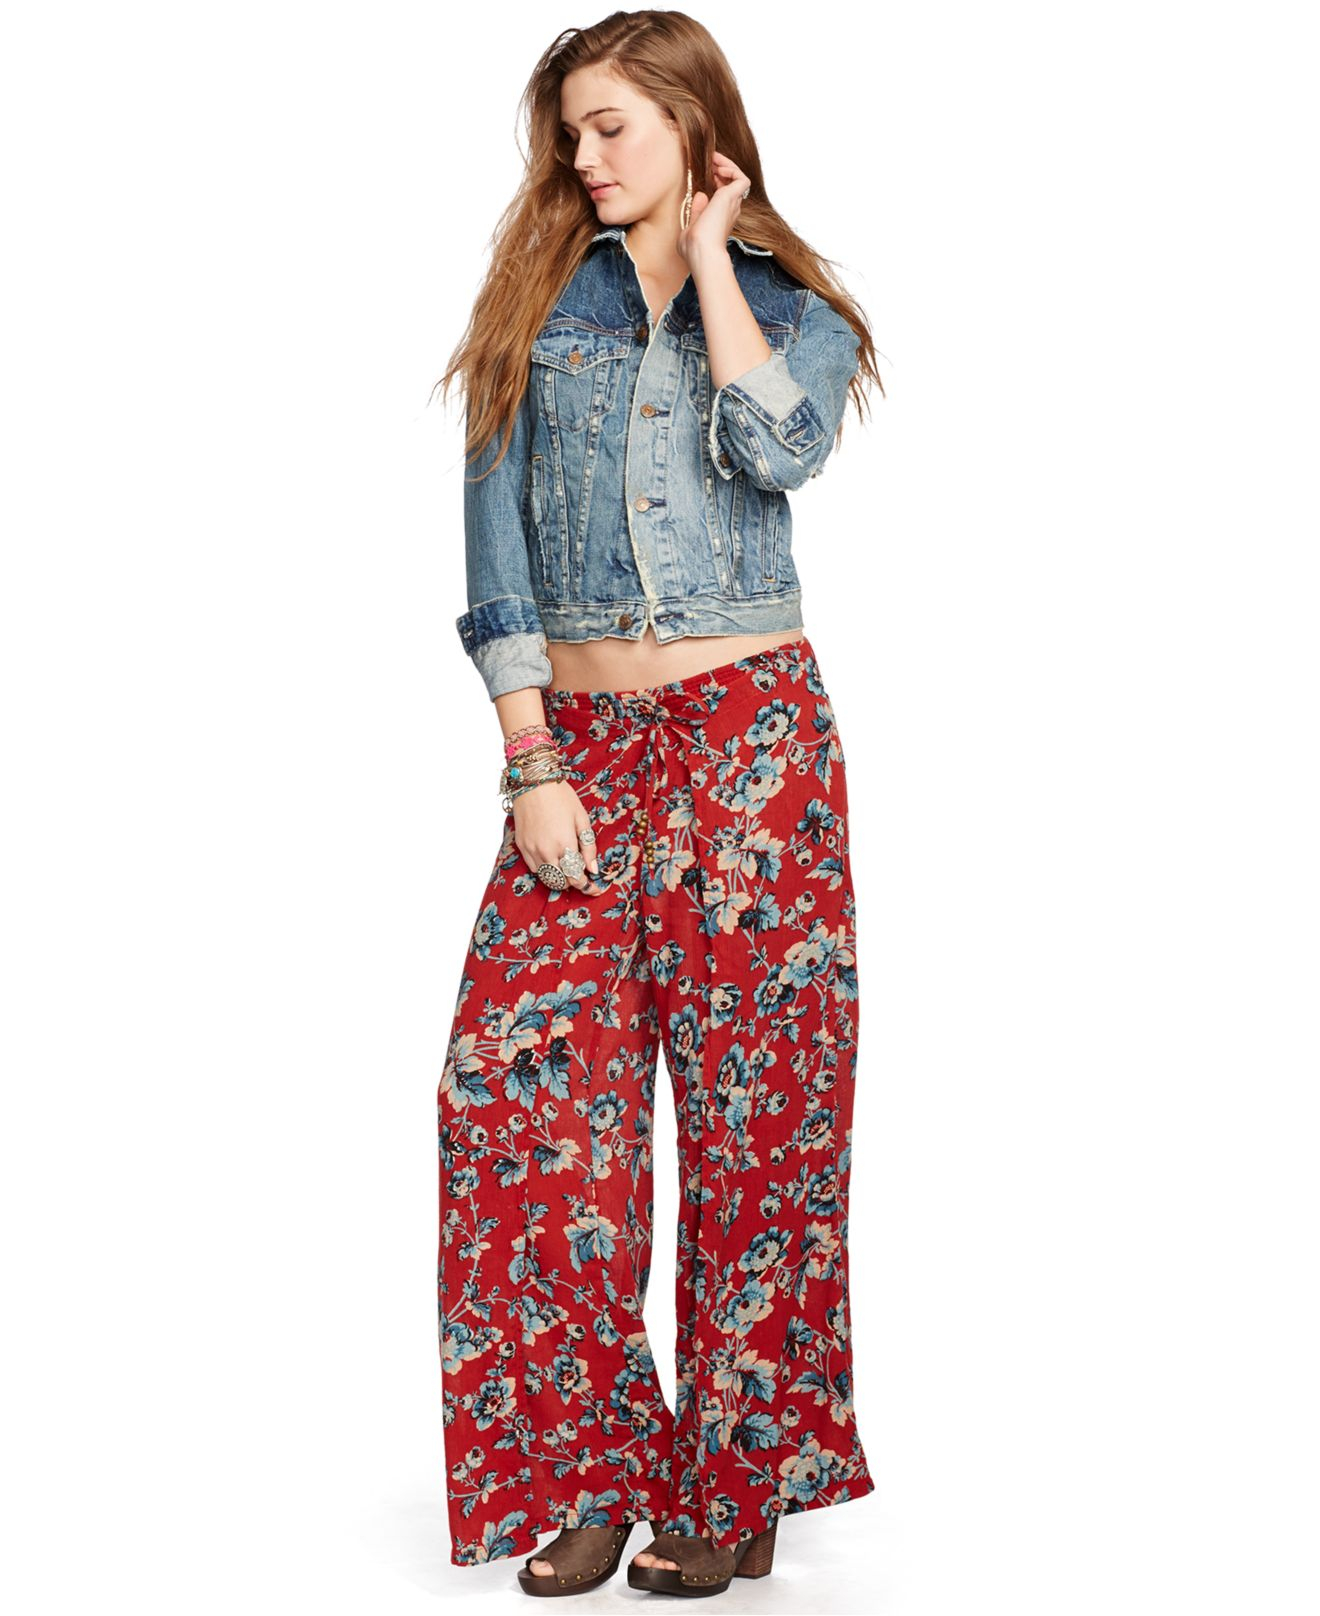 Denim & supply ralph lauren Floral-Print Smocked Wide-Leg Pants | Lyst